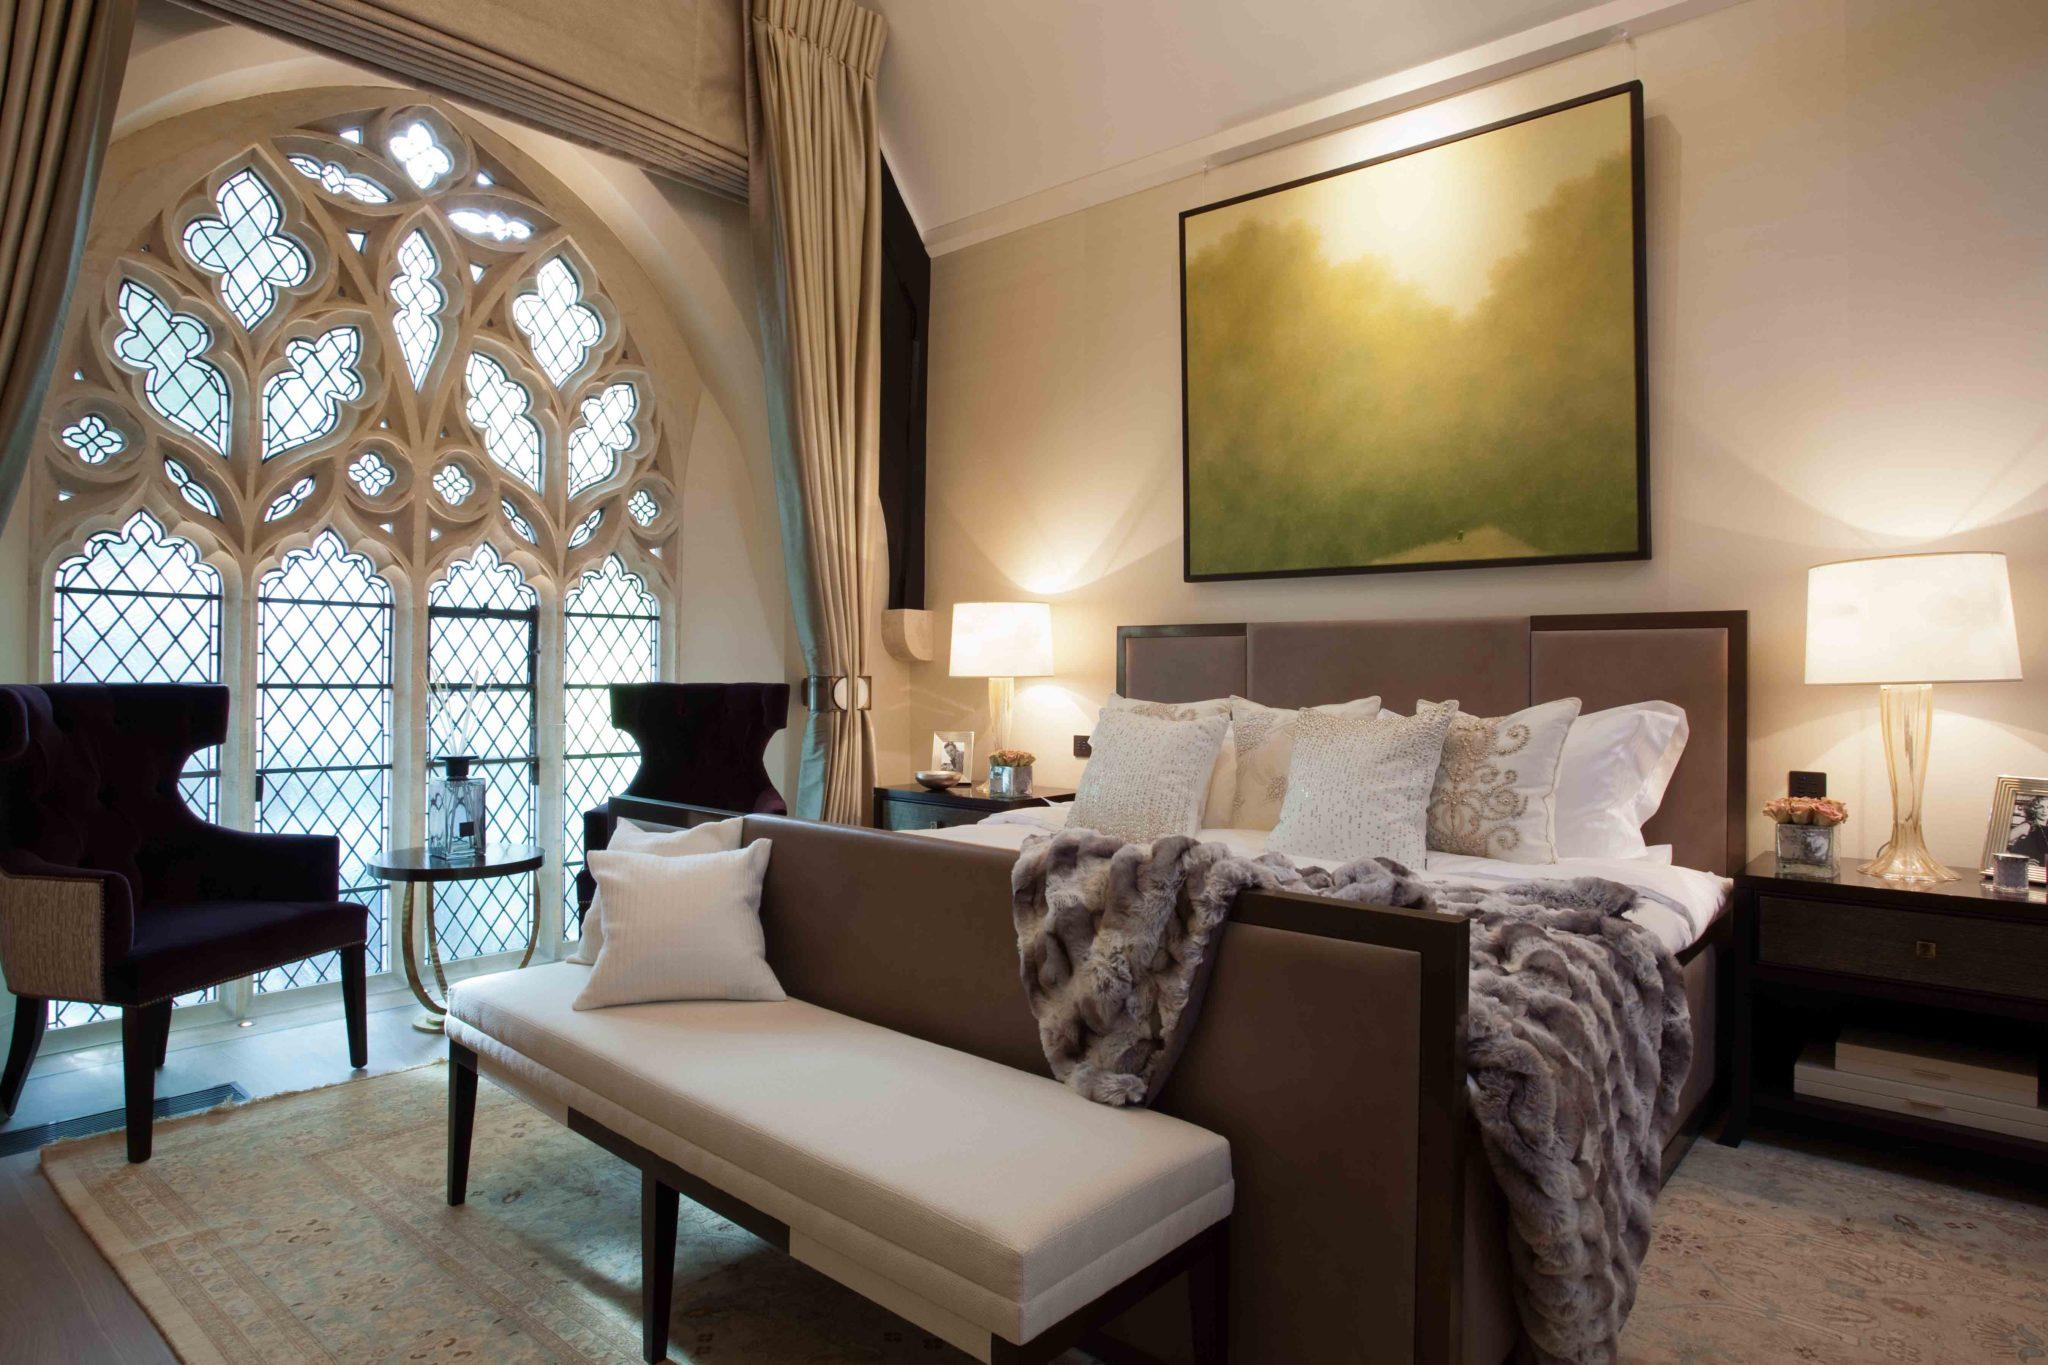 St. Saviours Church, Knightsbridge, London - master bedroom by Taylor Howes